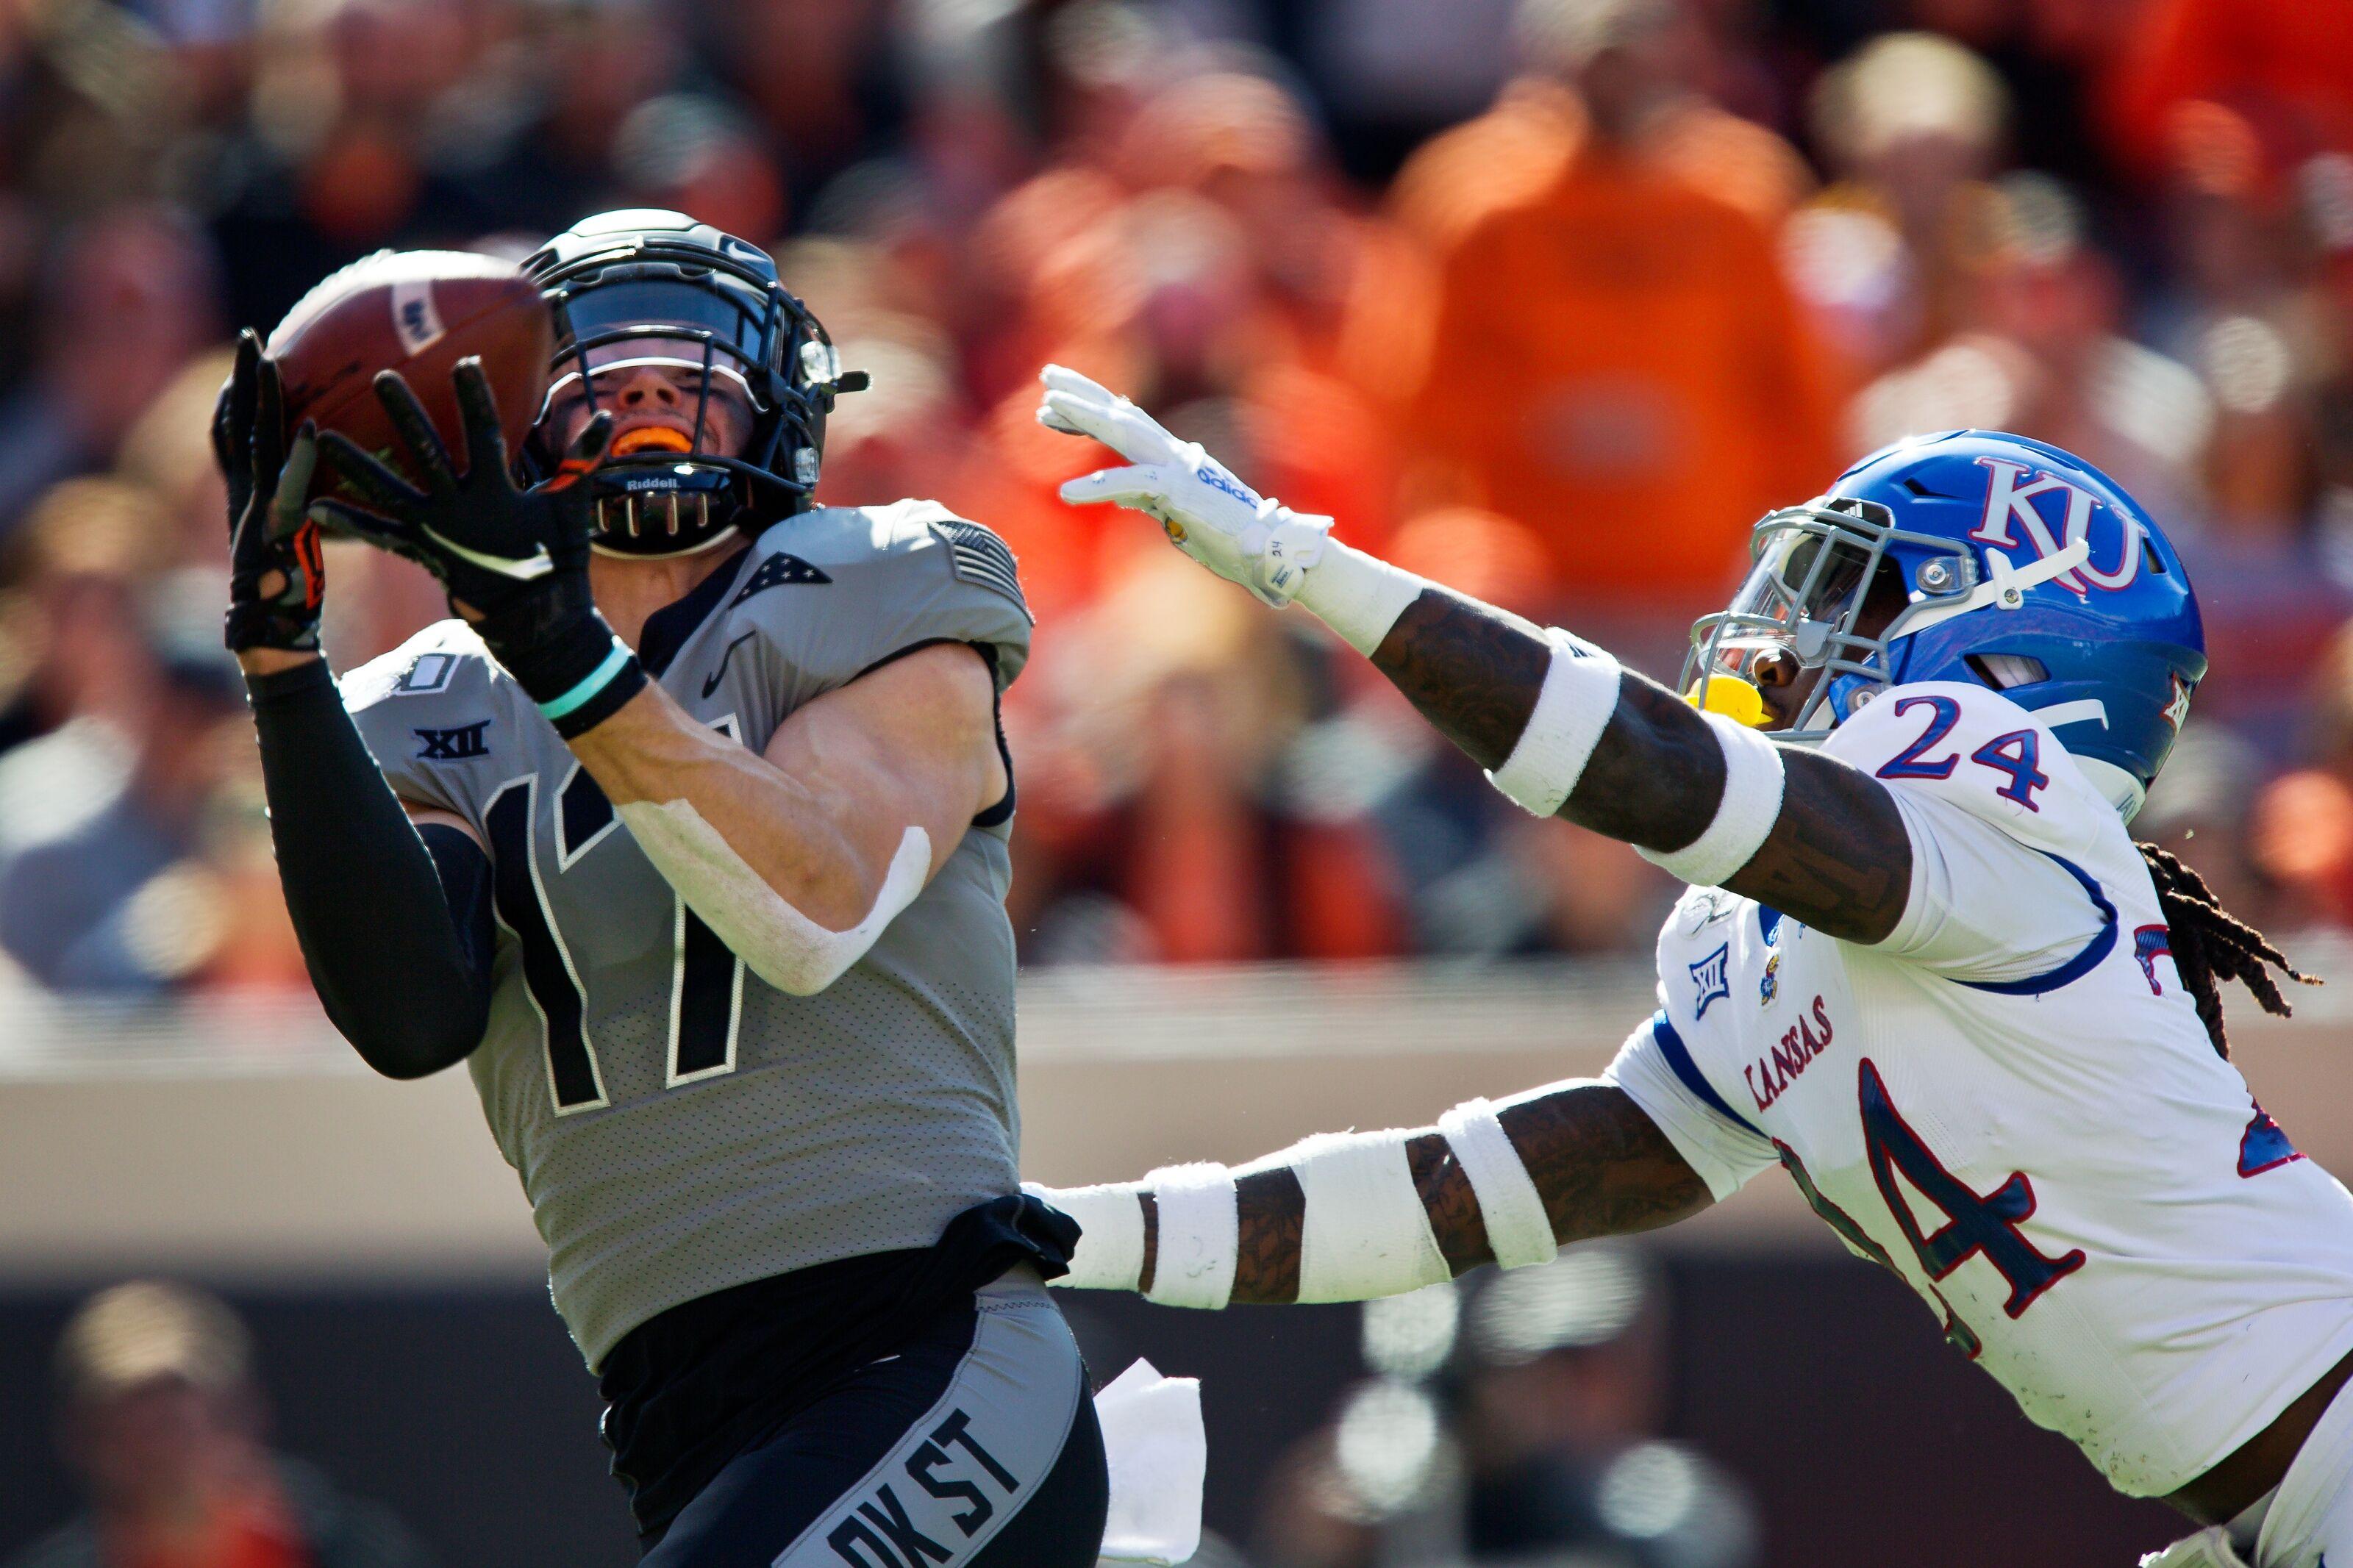 Kansas football vs. Oklahoma State Postgame: Jayhawks fail to show up